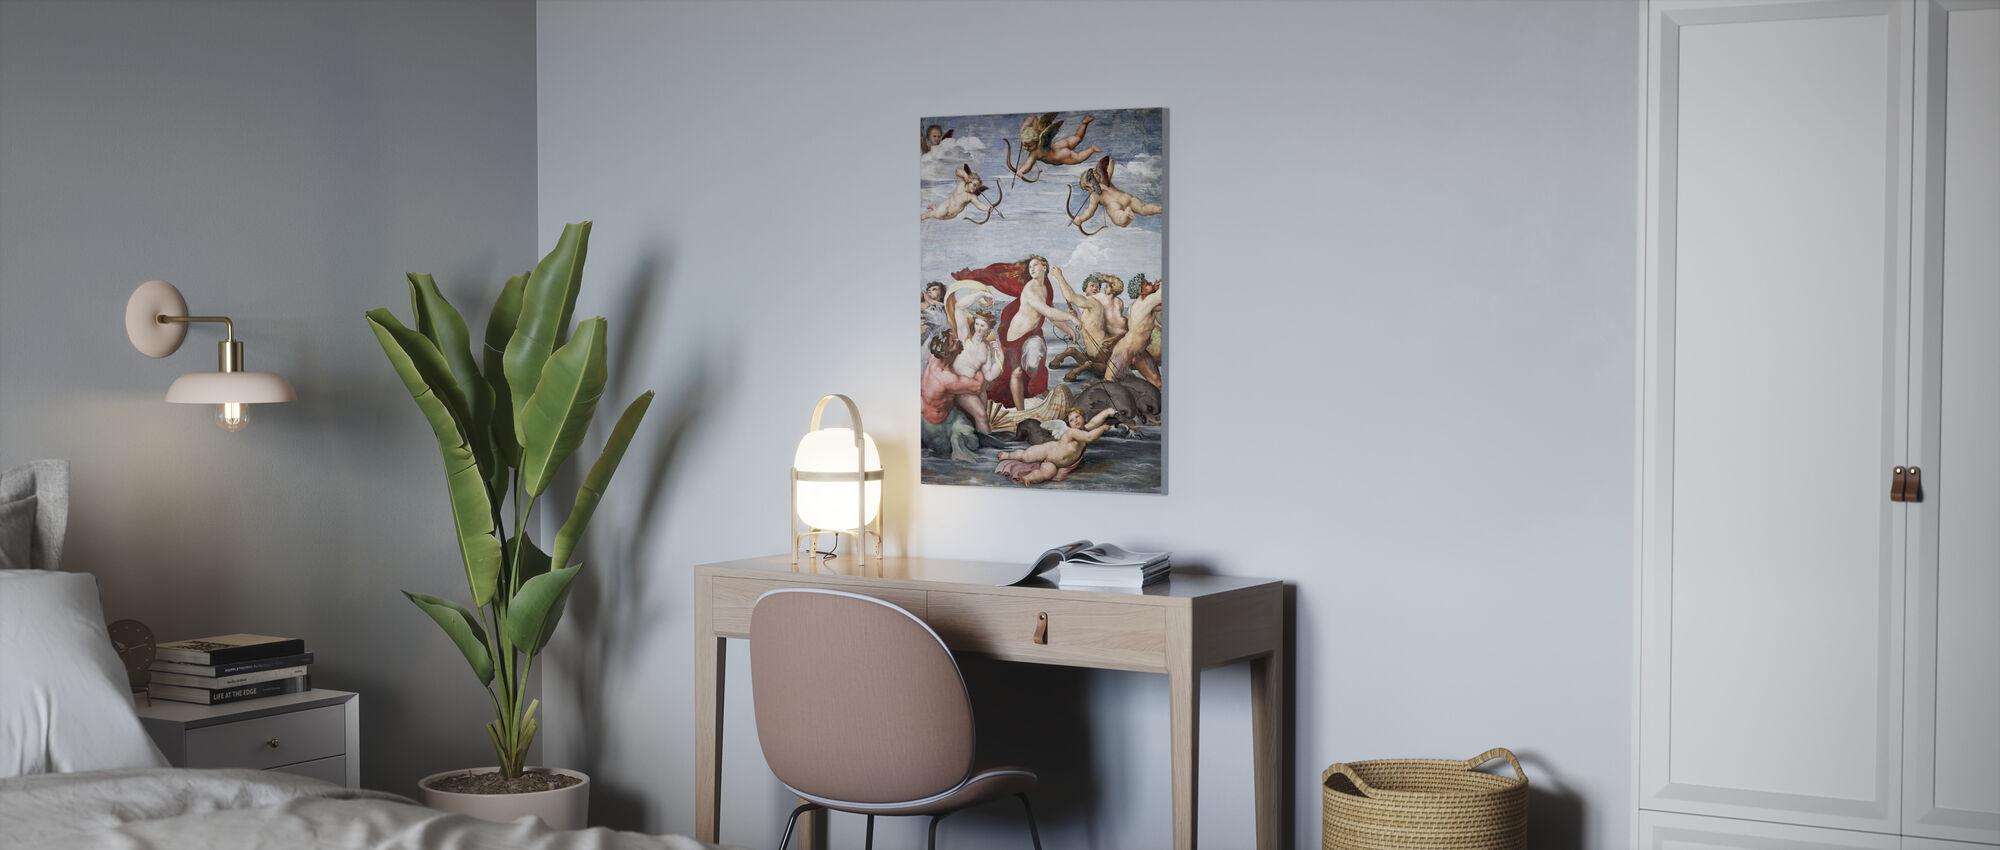 Triumph of Galatea - Raphael - Canvas print - Office